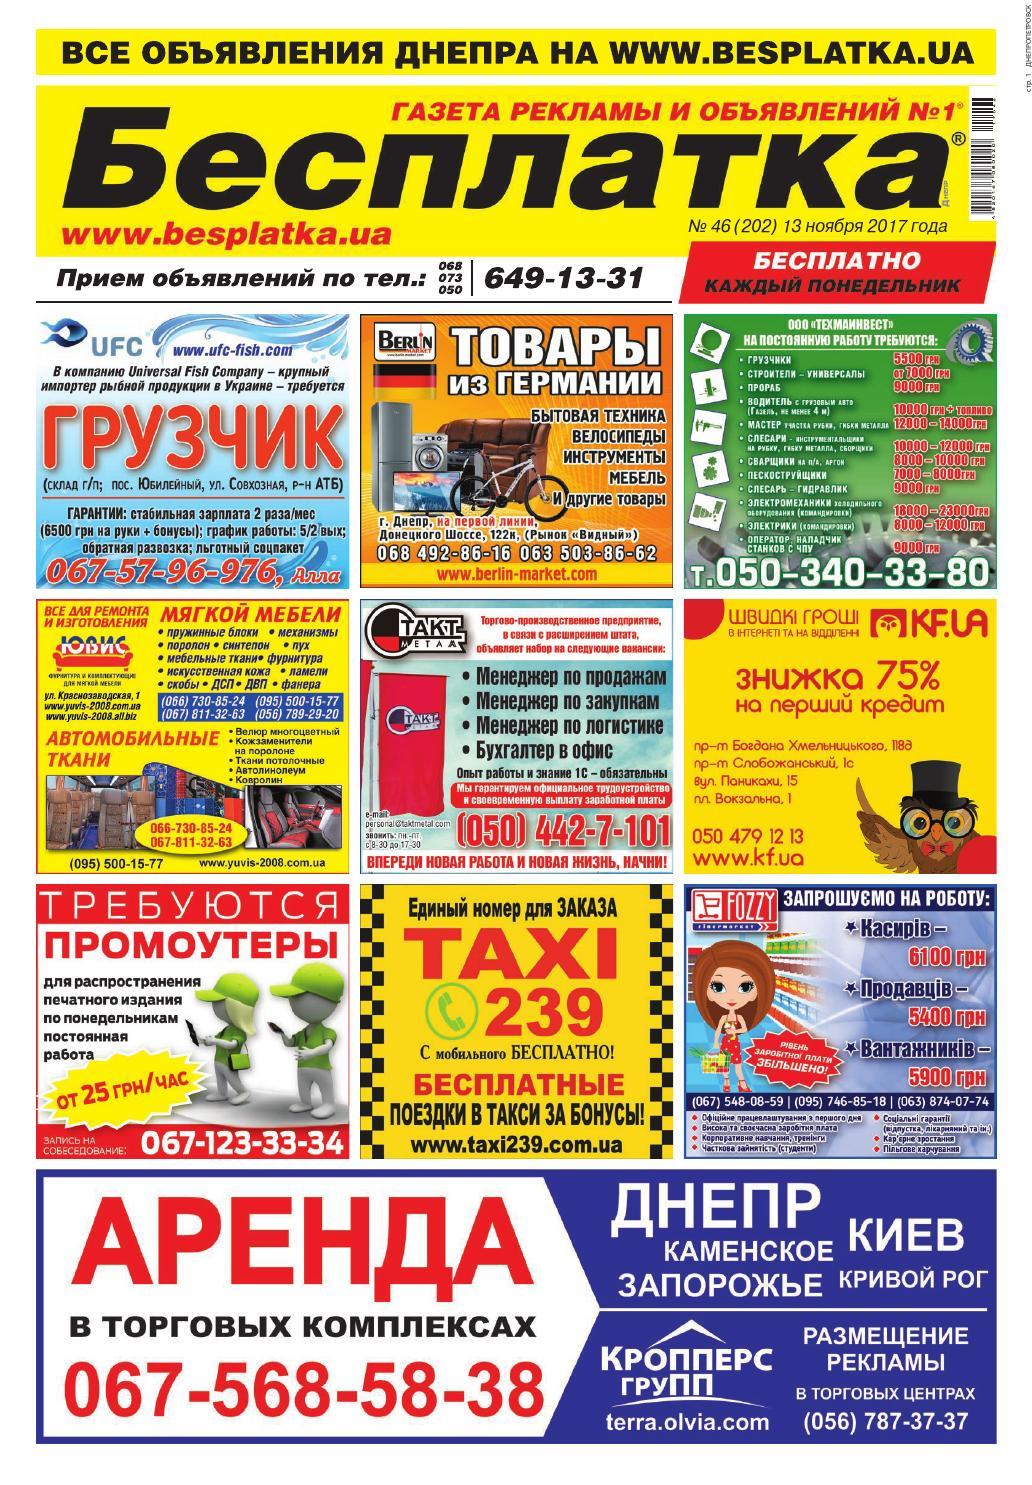 Besplatka  46 Днепр by besplatka ukraine - issuu bd1f4d37bf5